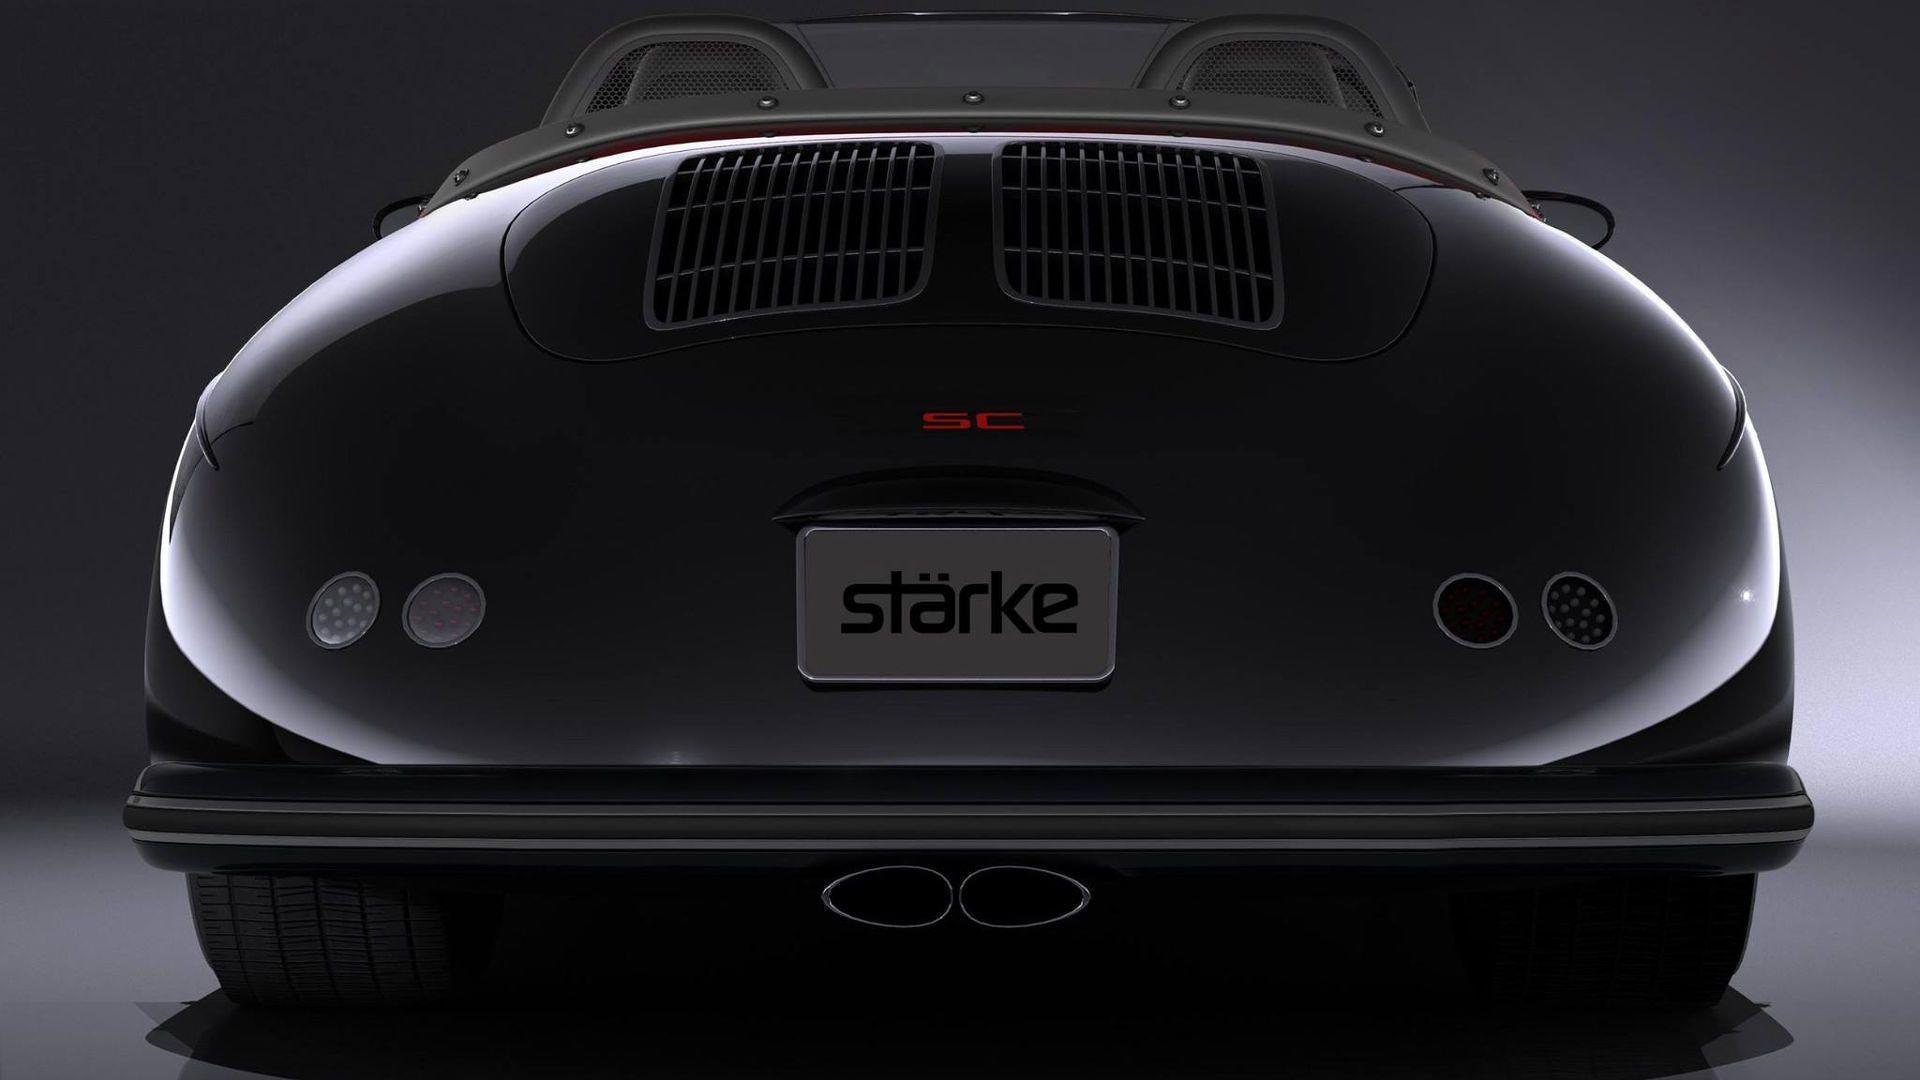 starke-revolution-speedster-sc (2)